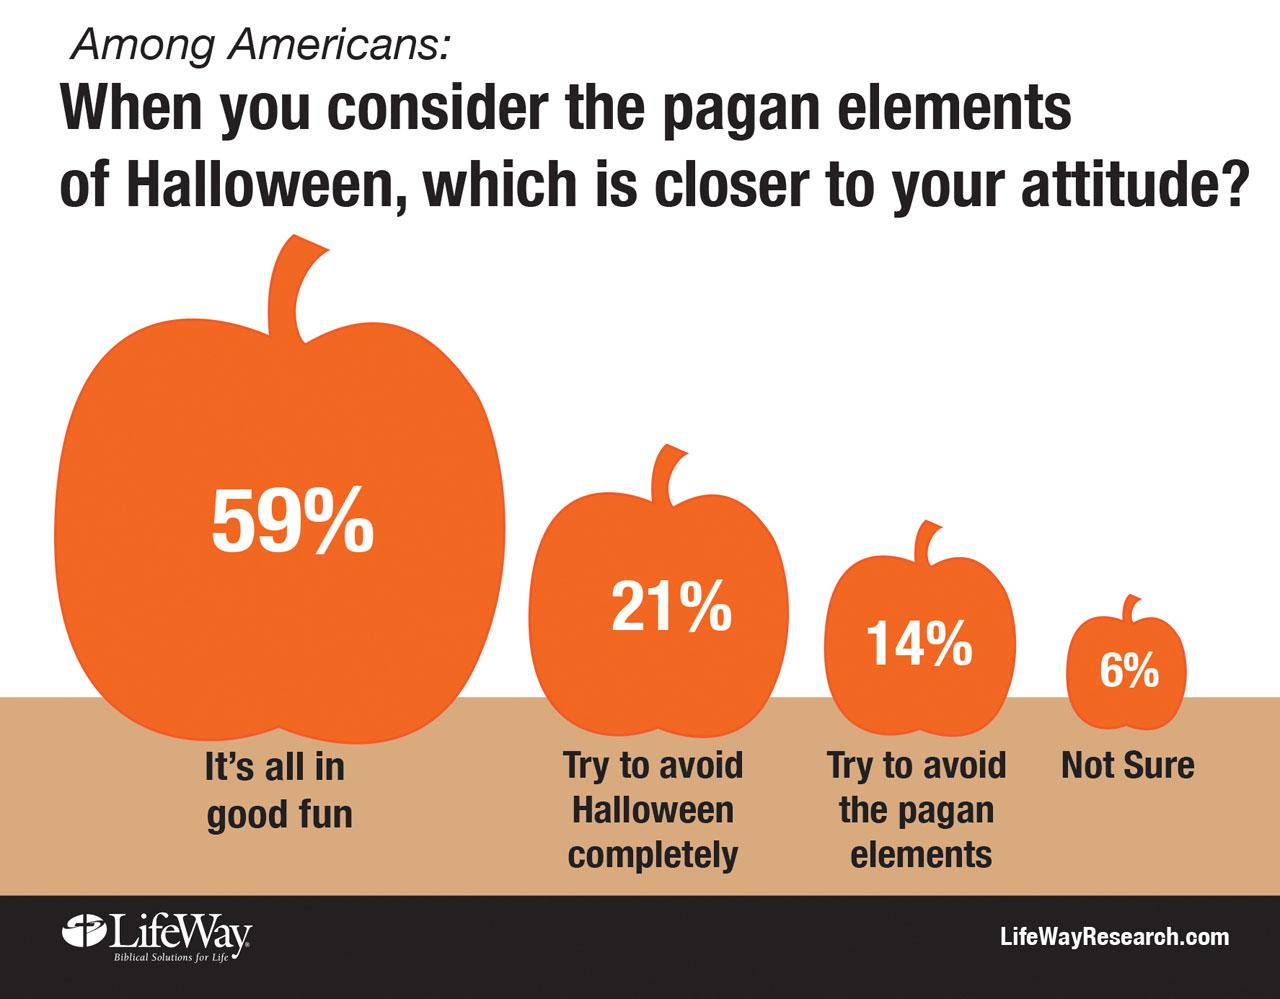 Halloween draws focus of new study